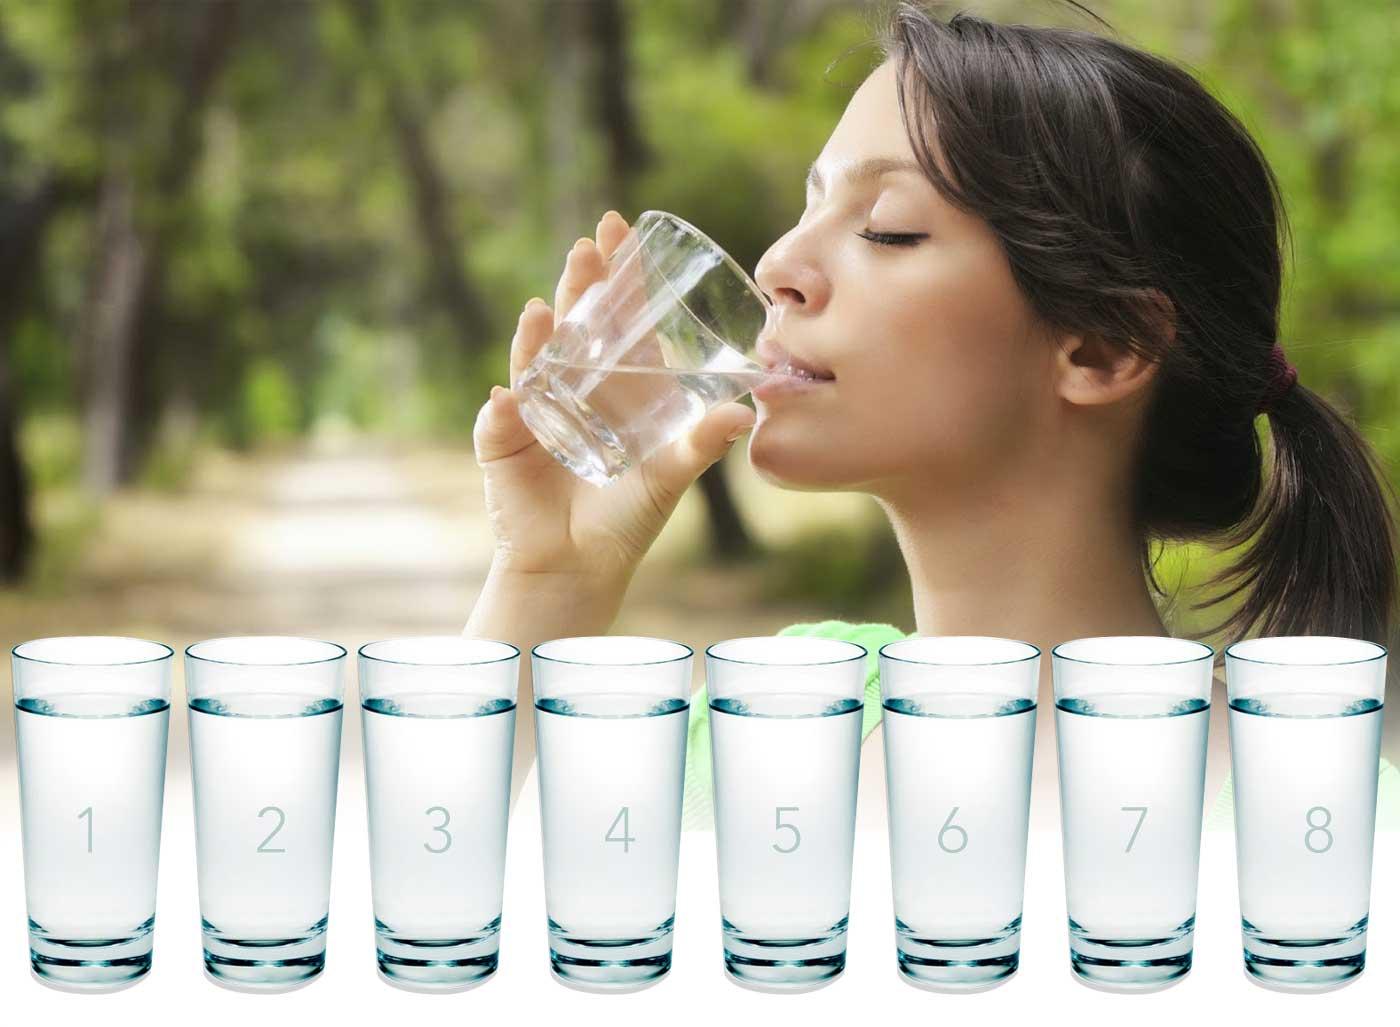 Water Intake Calculator - AQUA4BALANCE